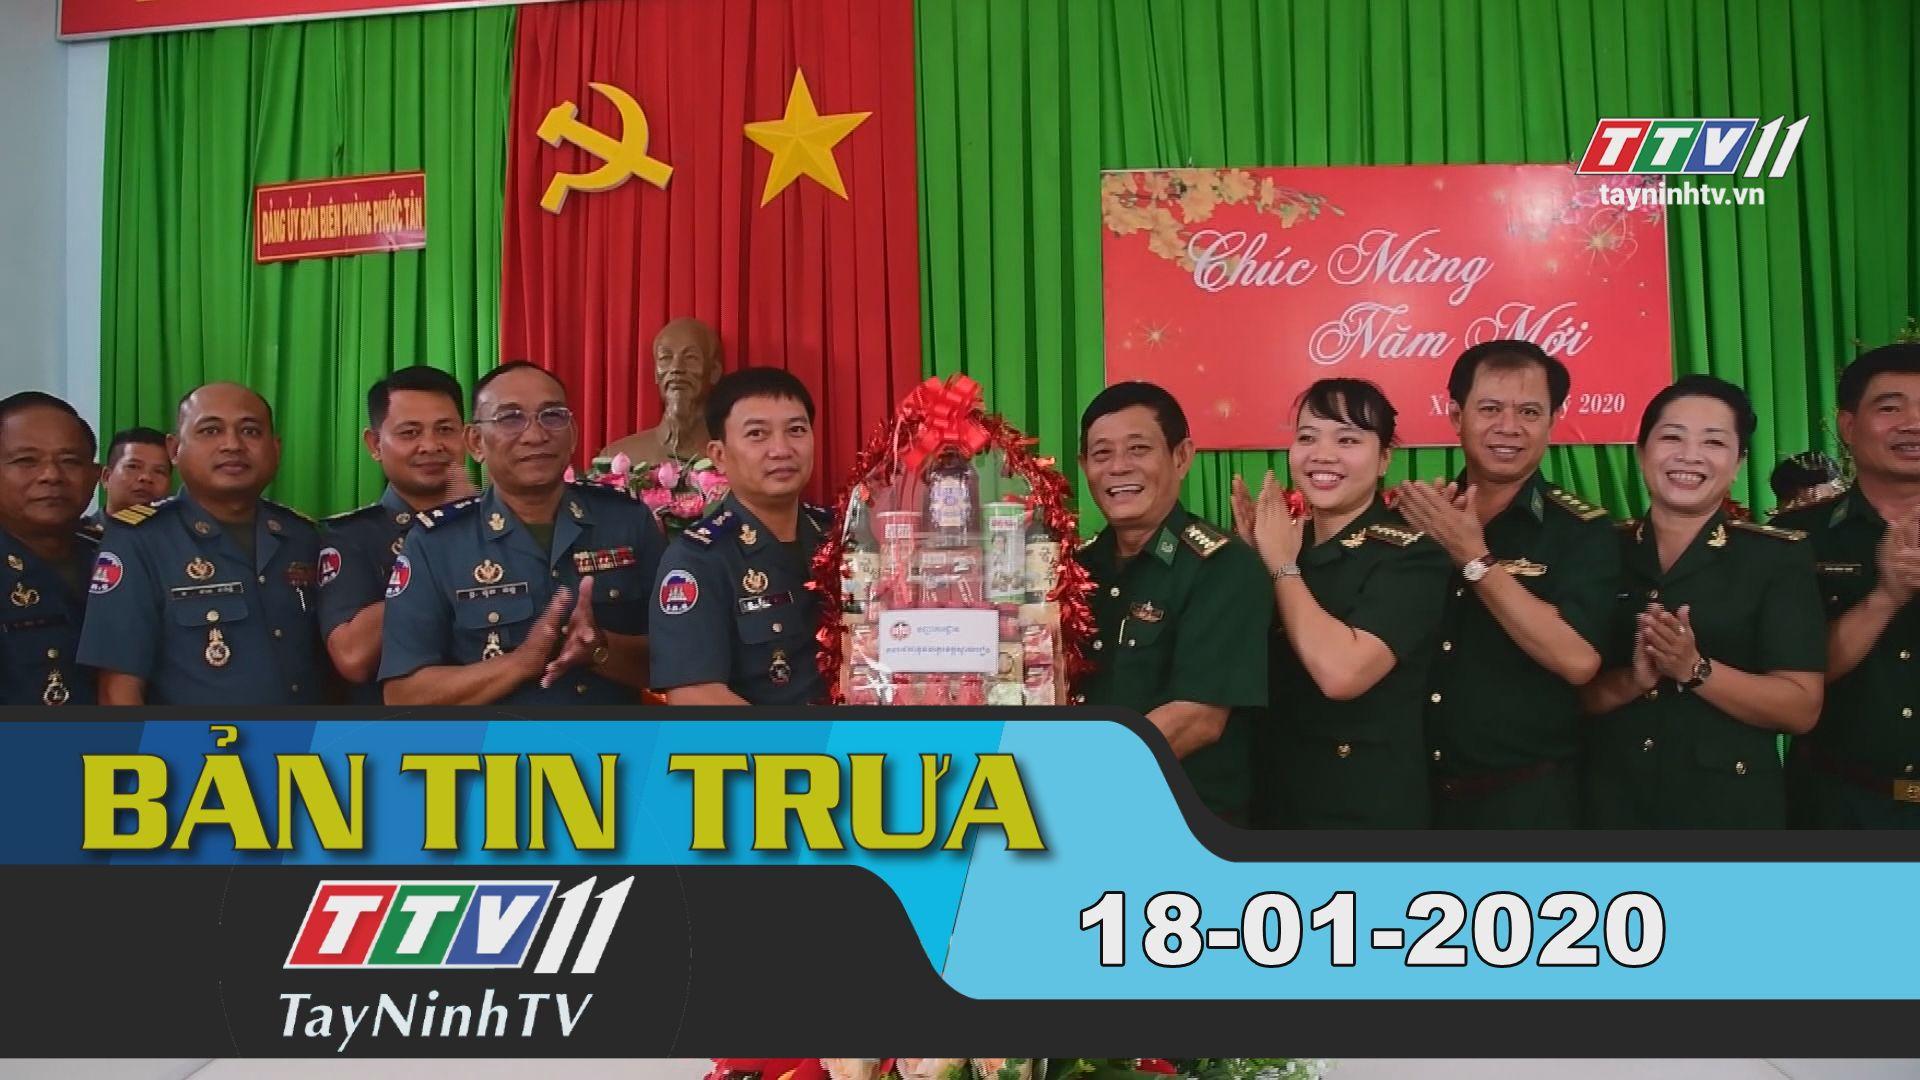 Bản tin trưa 18-01-2020 | Tin tức hôm nay | TayNinhTV